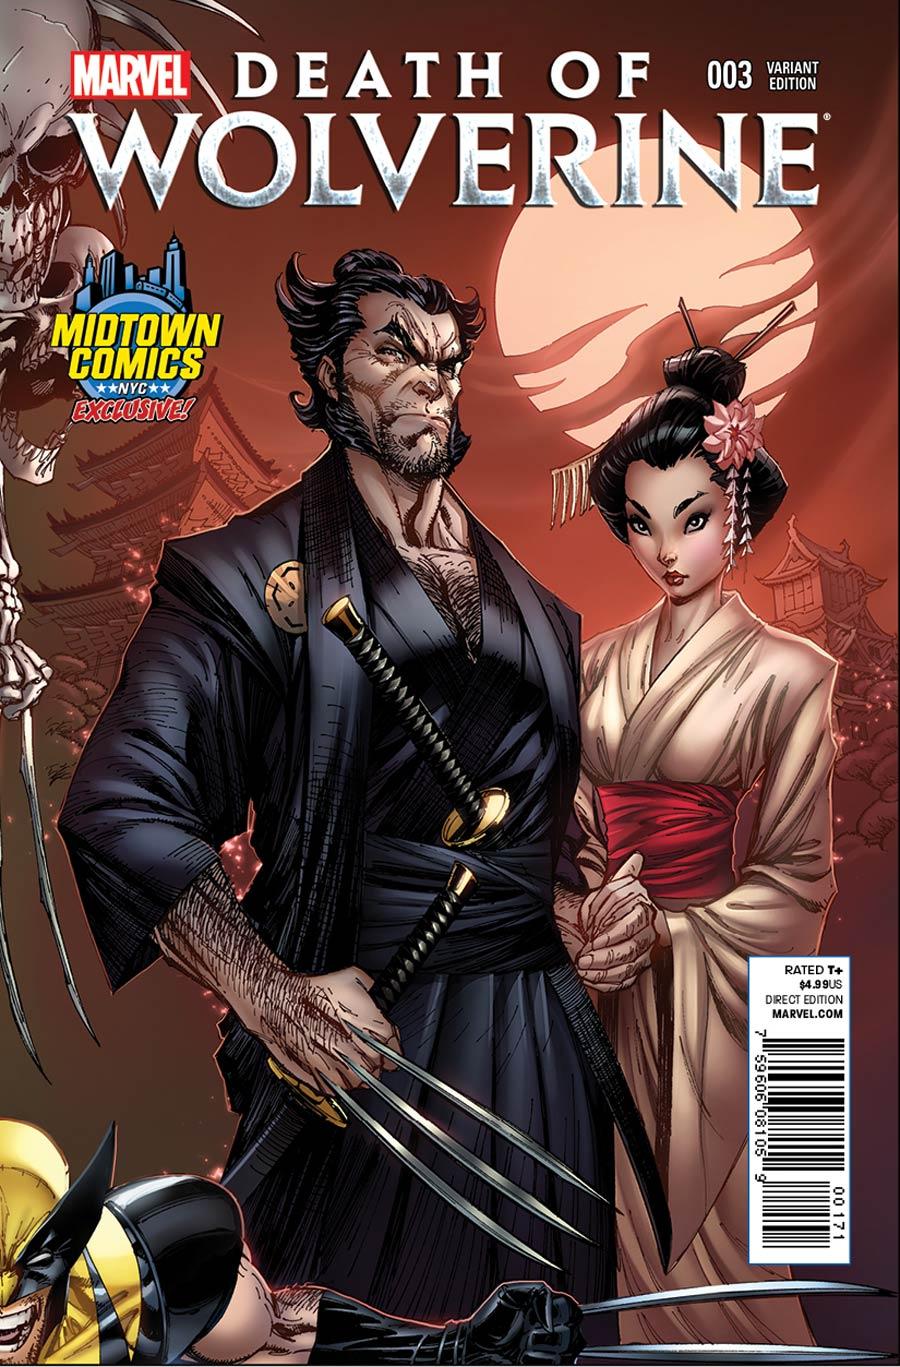 La Mort de Wolverine 3 - Death of Wolverine Part Three (Midtown Comics Exclusive Variant Cover)